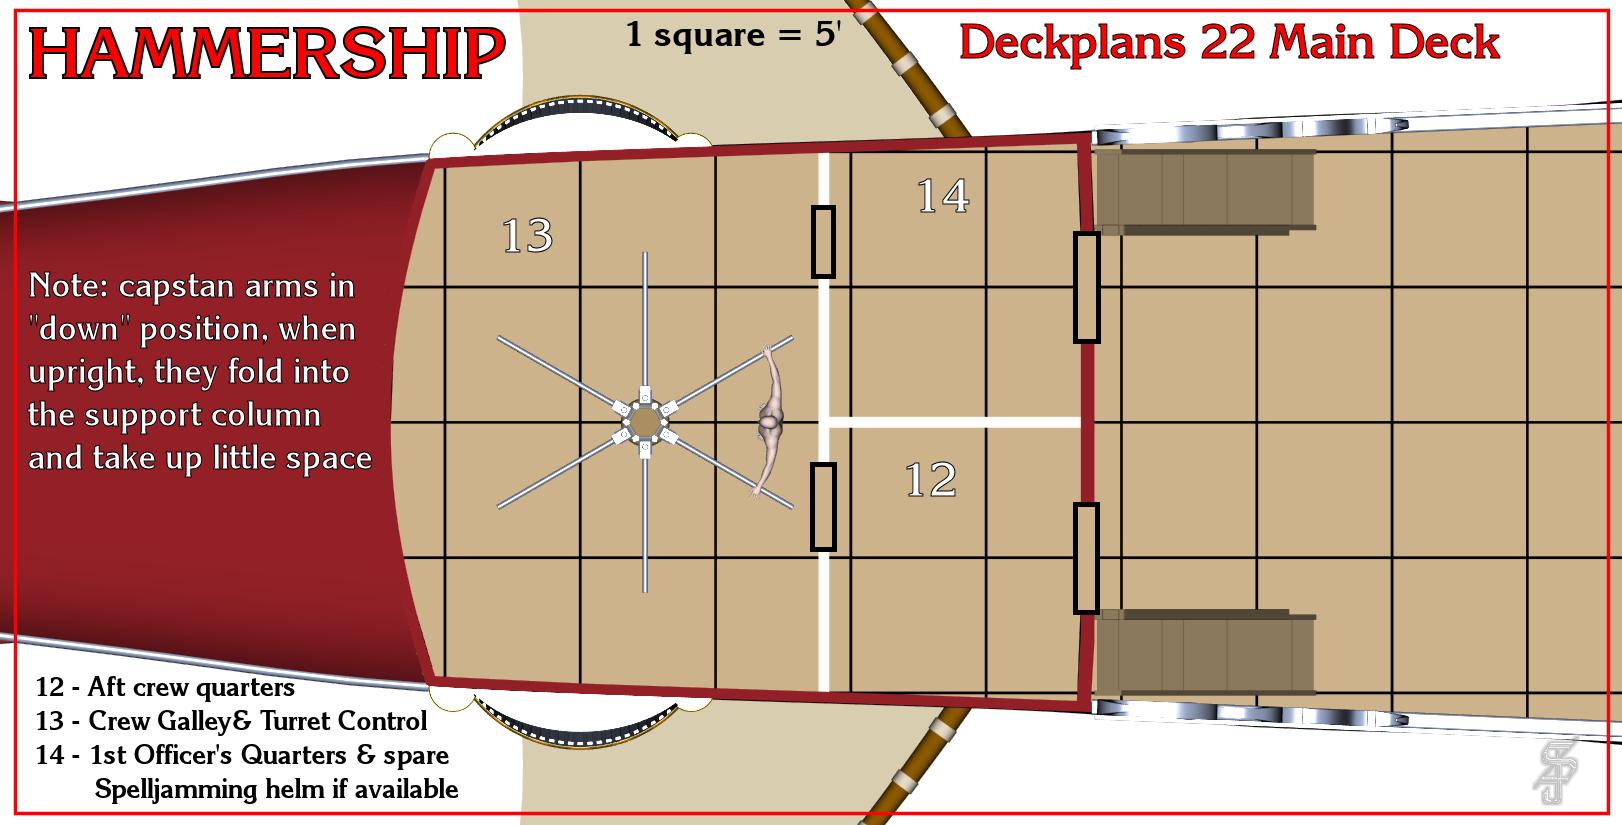 Hammership layout 22